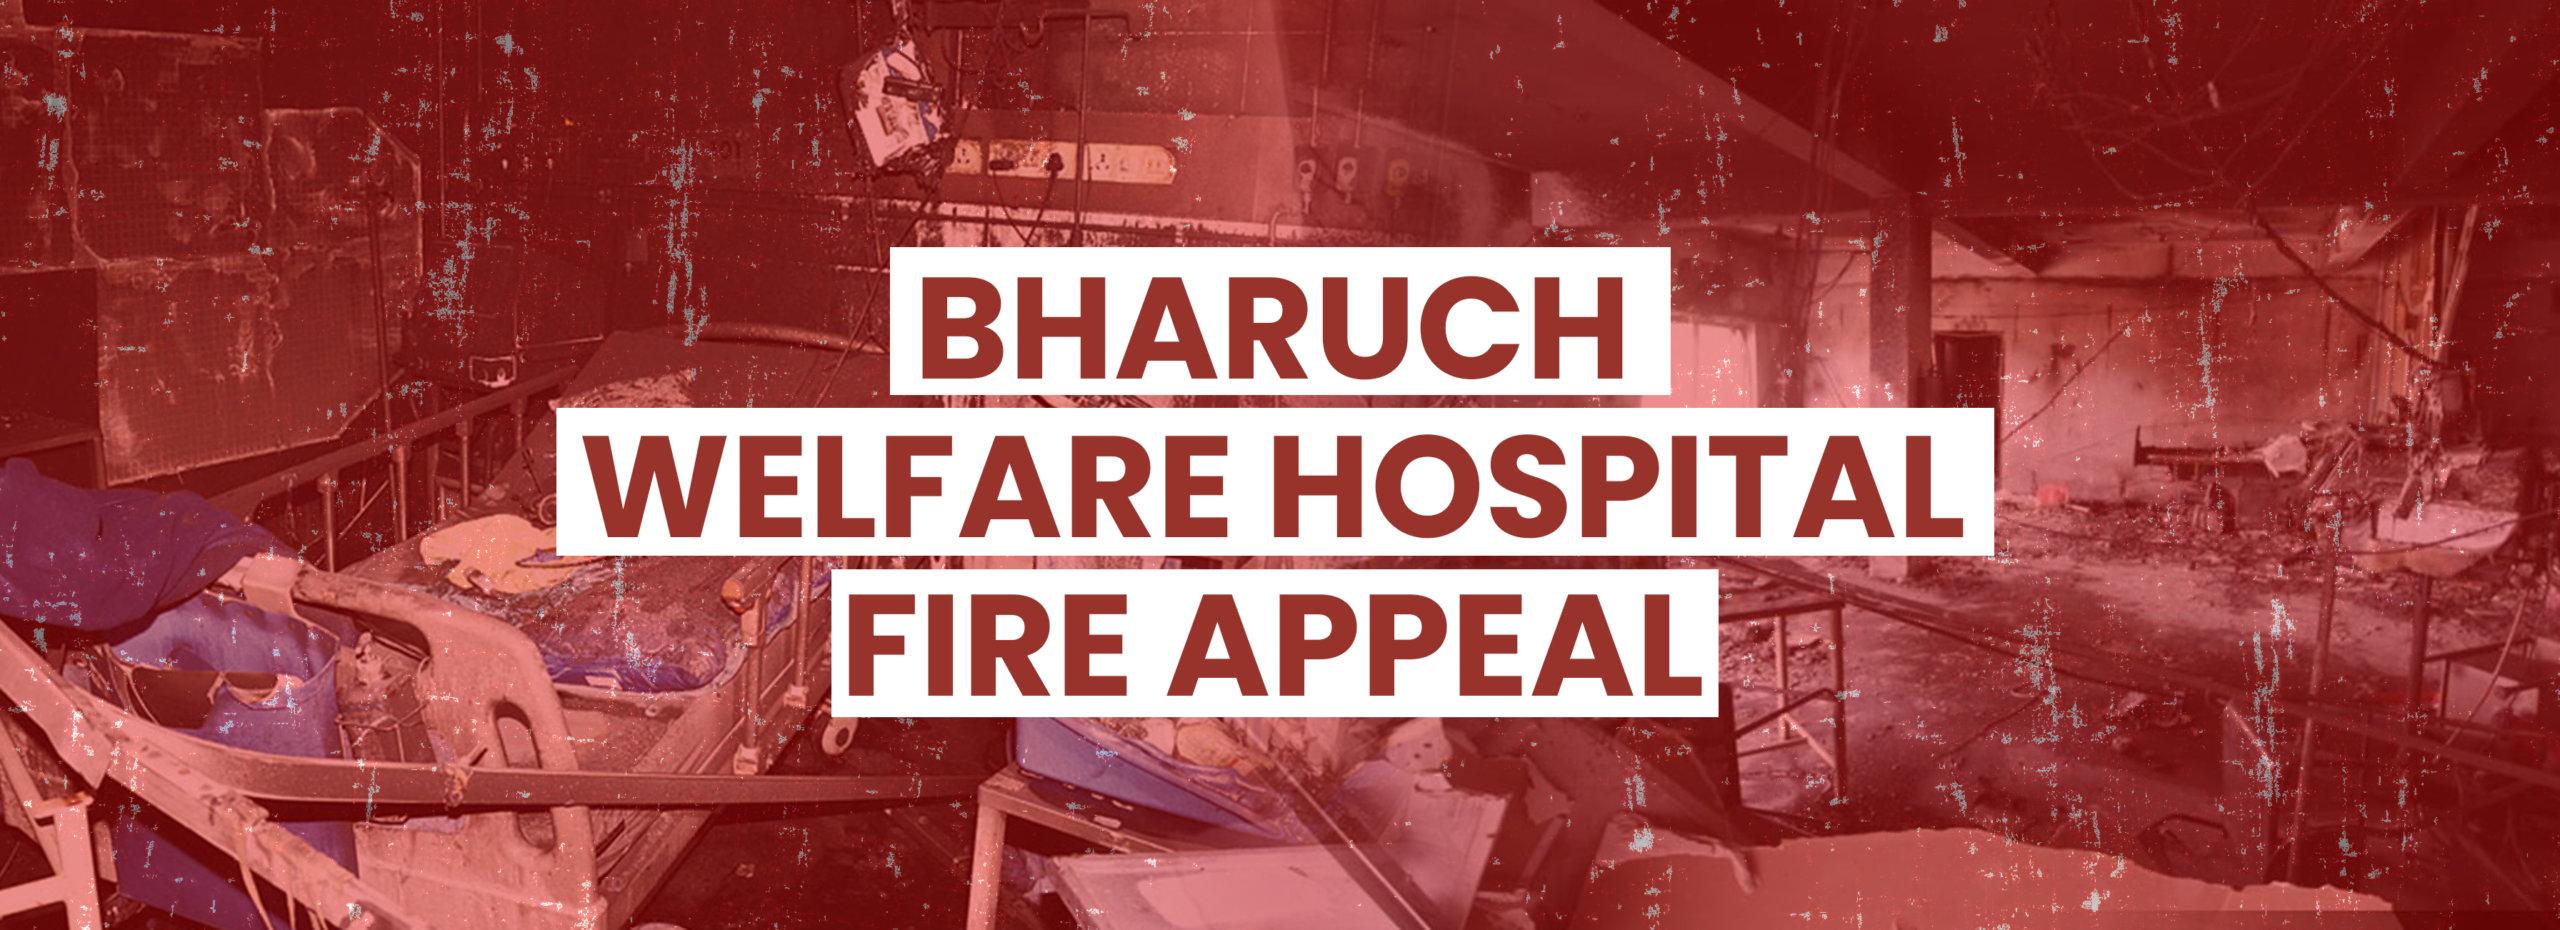 Bharuch welfare Hospital Fire Appeal